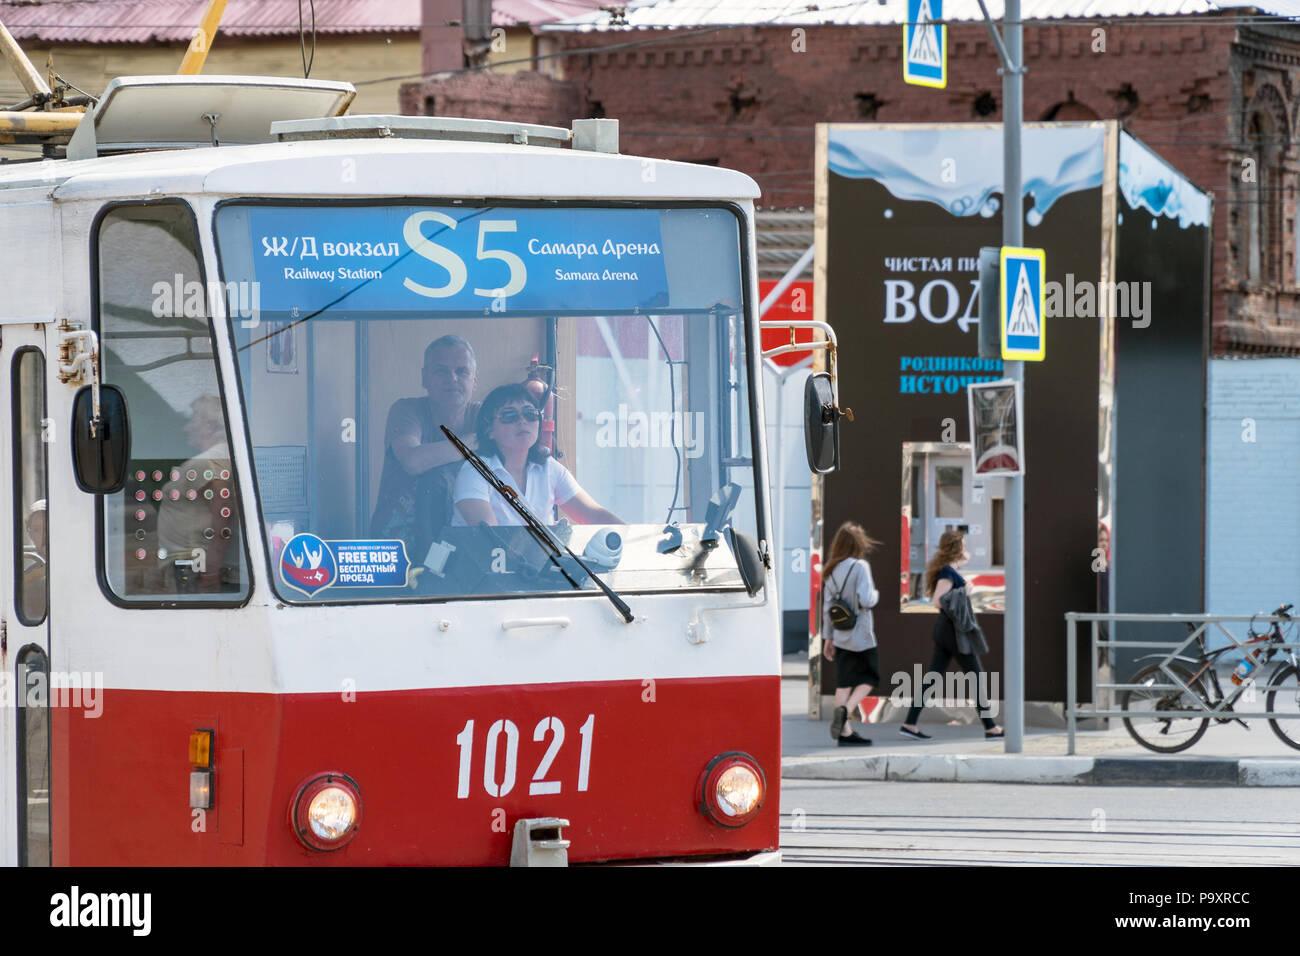 Tram on the street - Stock Image